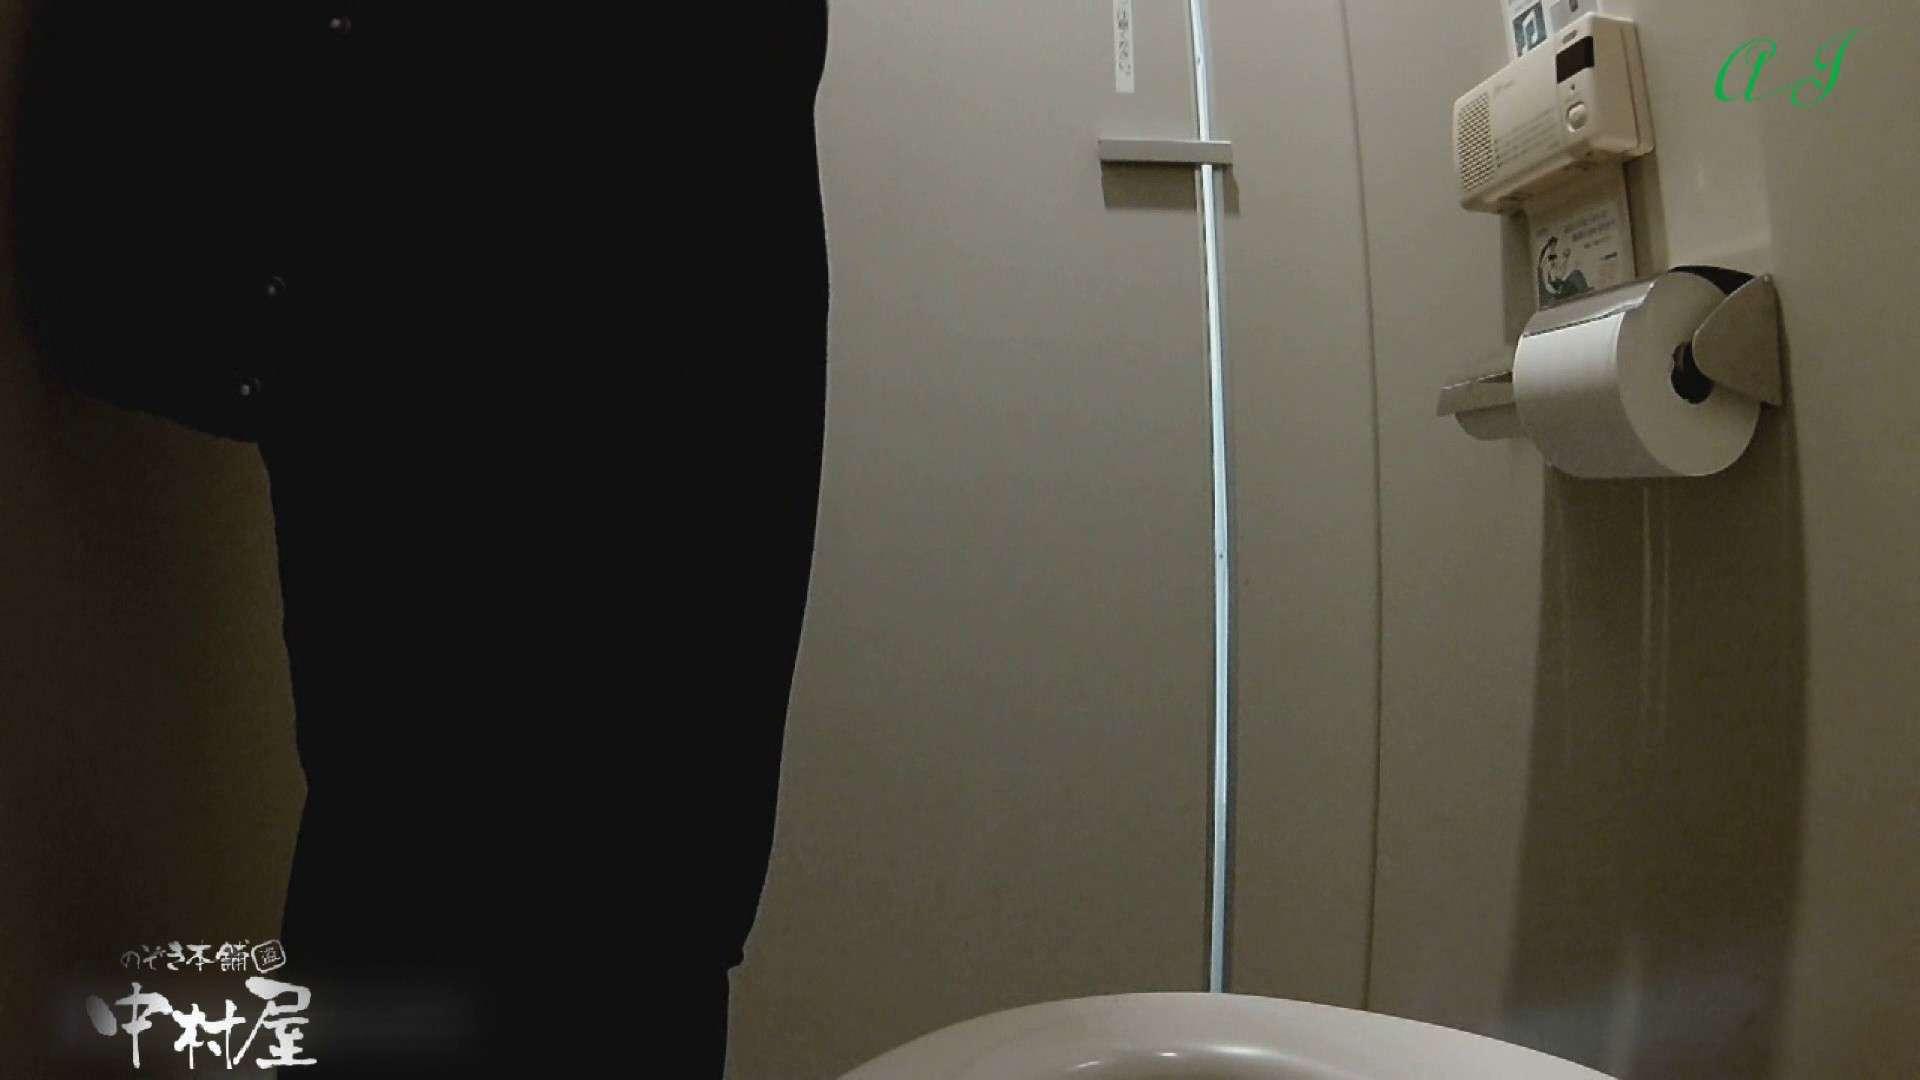 有名大学女性洗面所 vol.84後編 洗面所 | OLすけべ画像  93連発 77